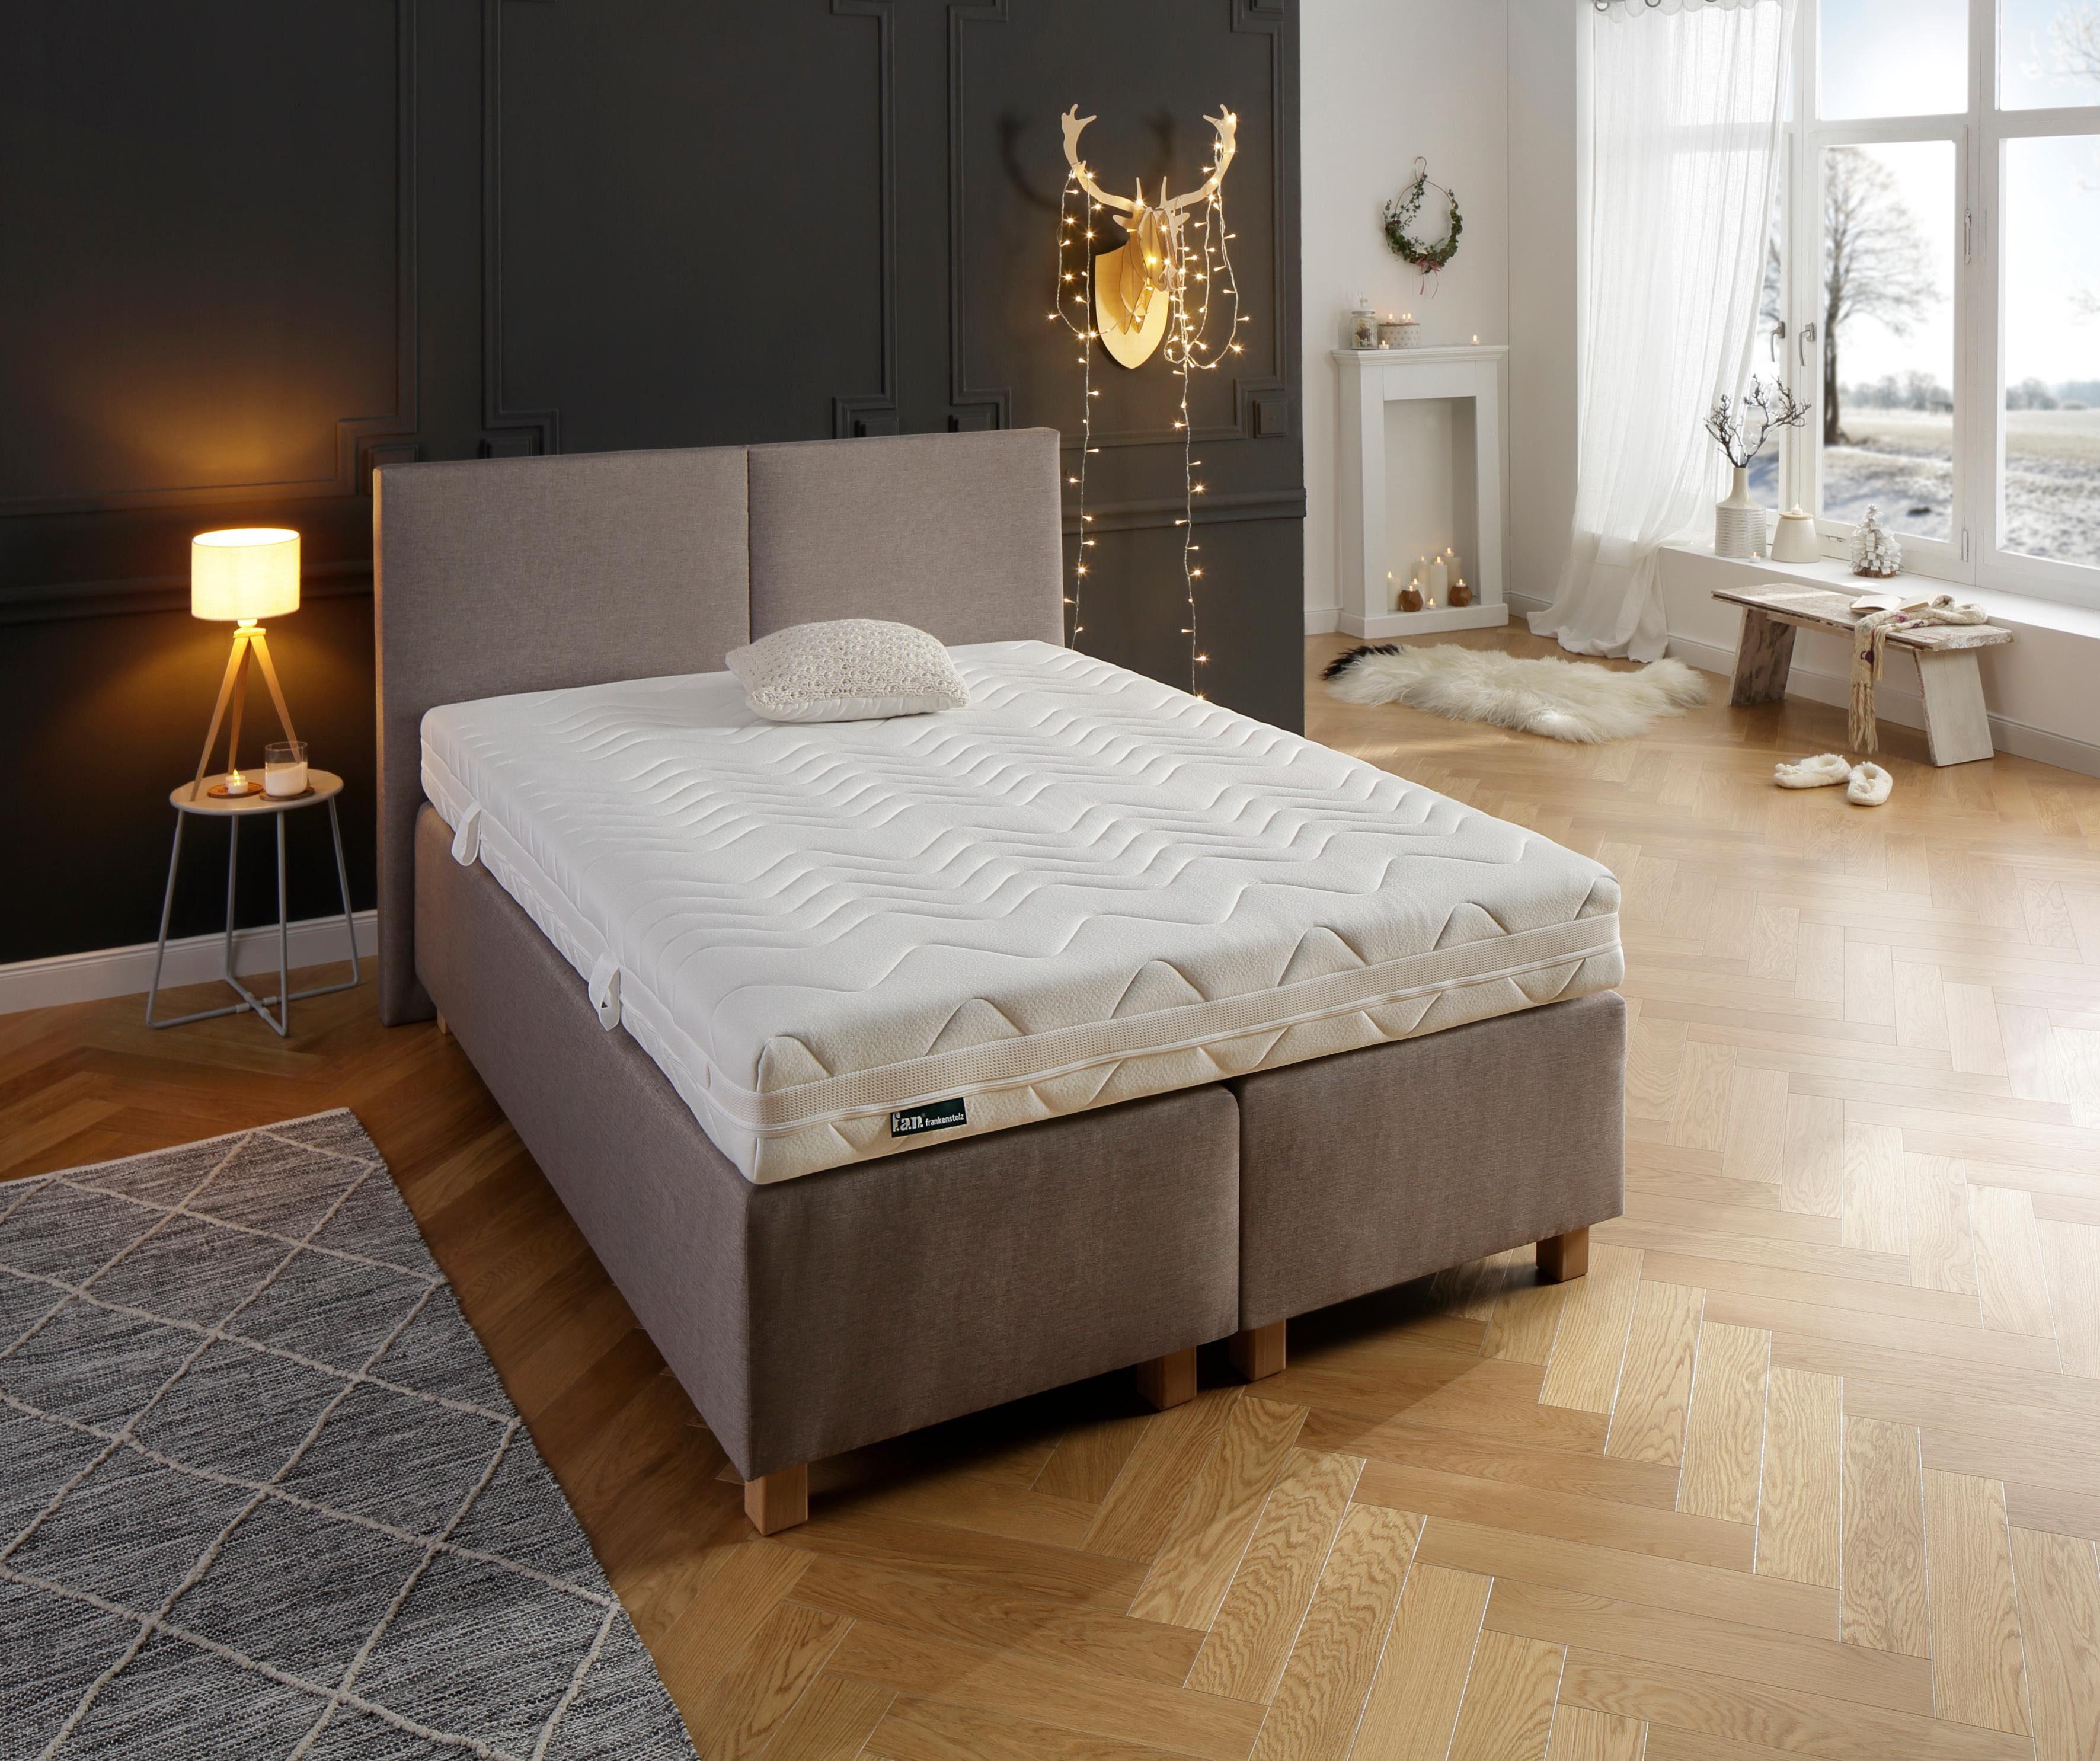 taschenfederkernmatratze multiplus t f a n. Black Bedroom Furniture Sets. Home Design Ideas